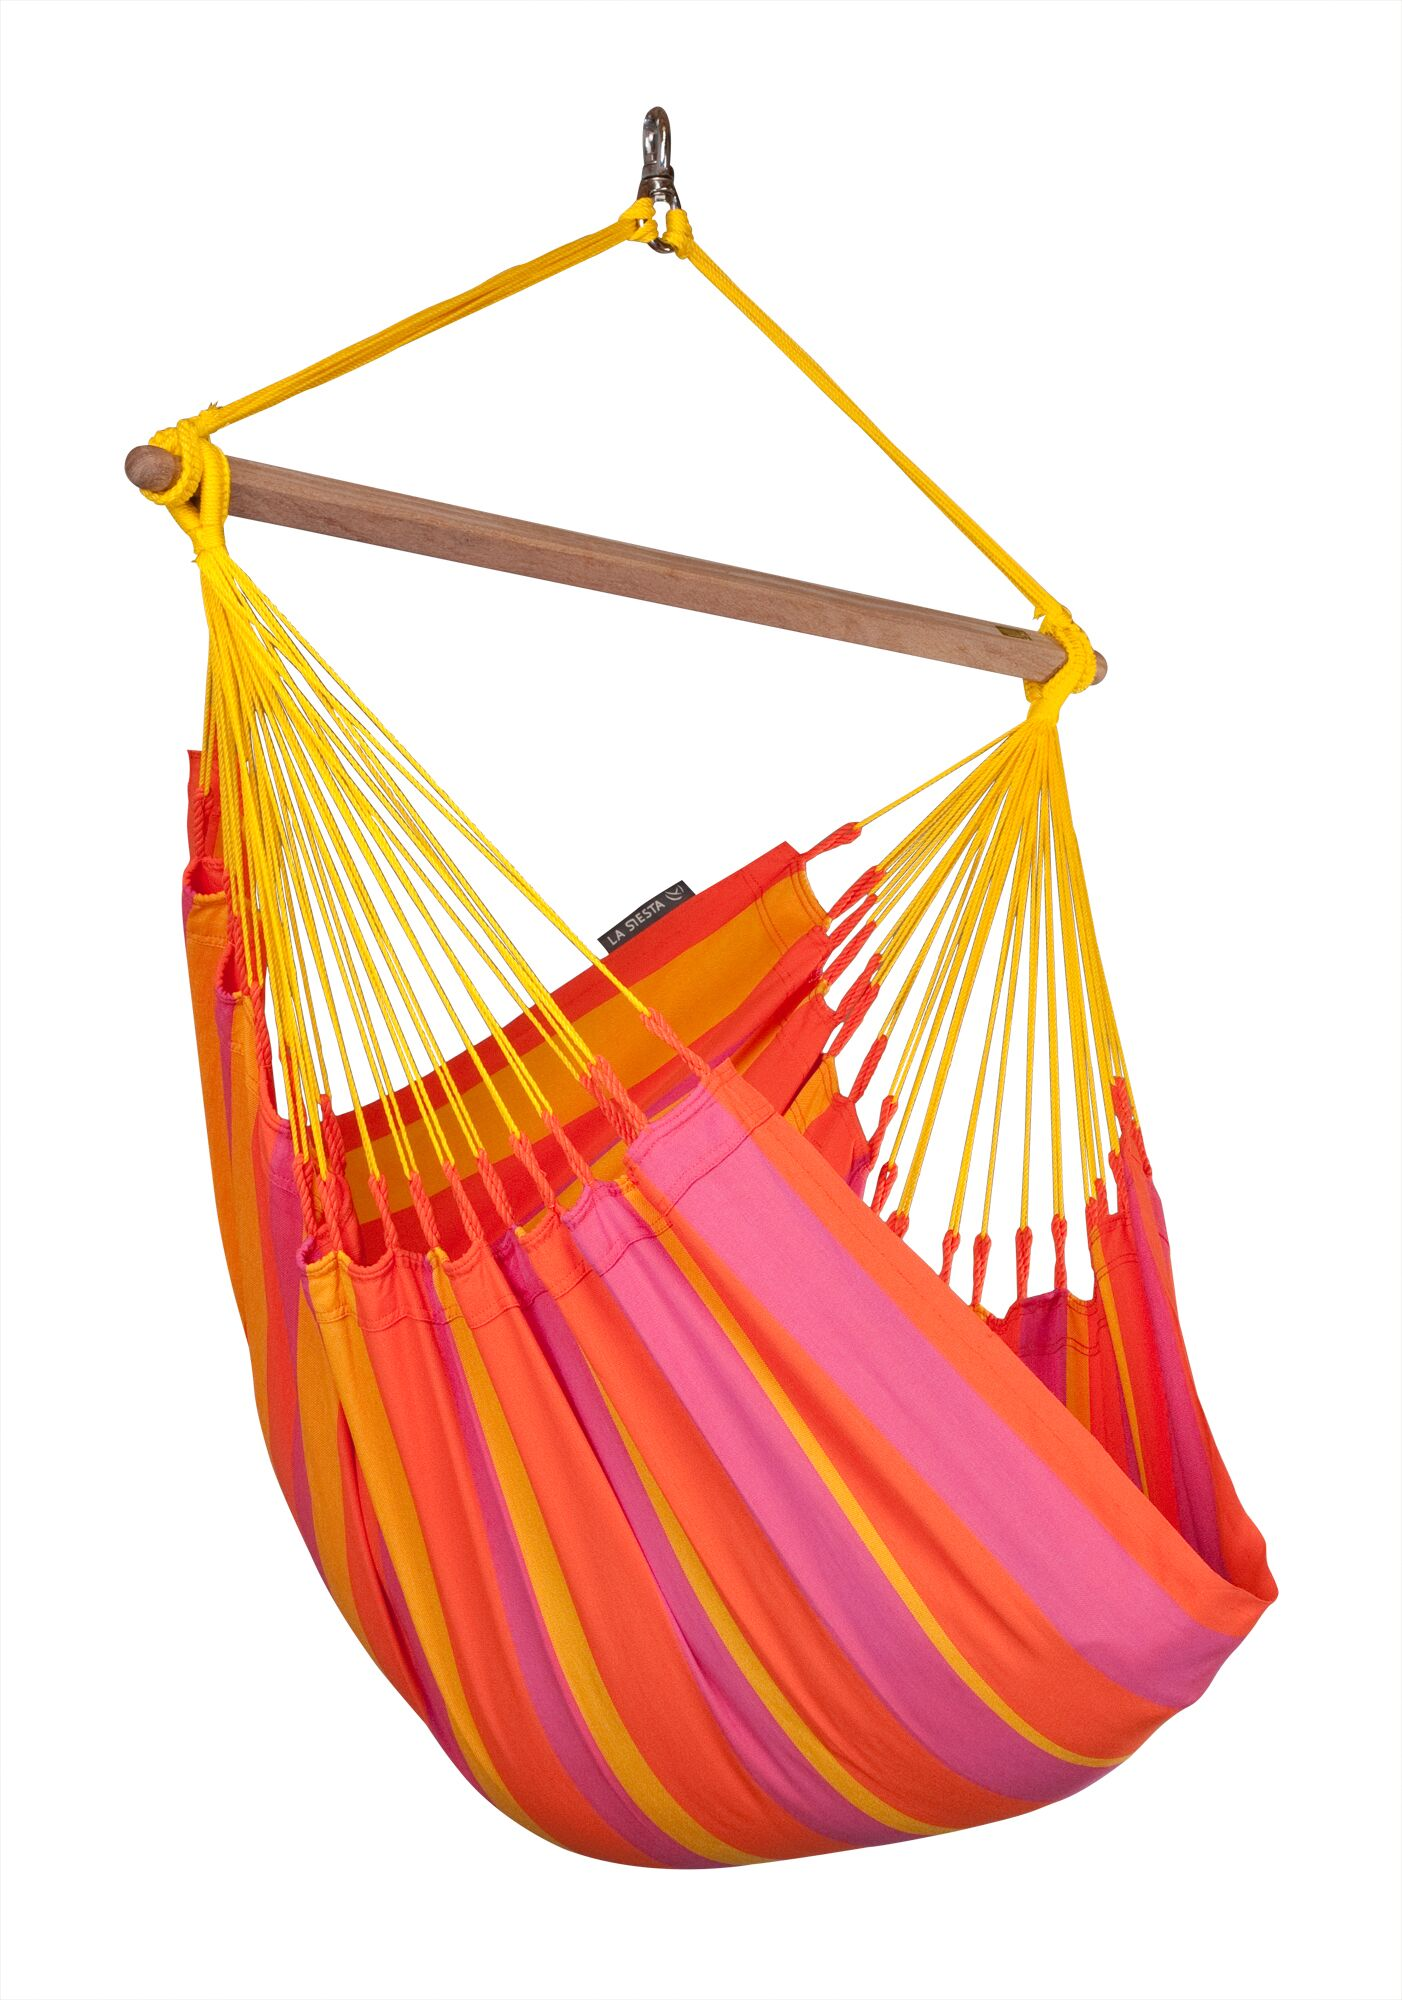 SONRISA Weatherproof Basic Olefin Chair Hammock Color: Mandarine